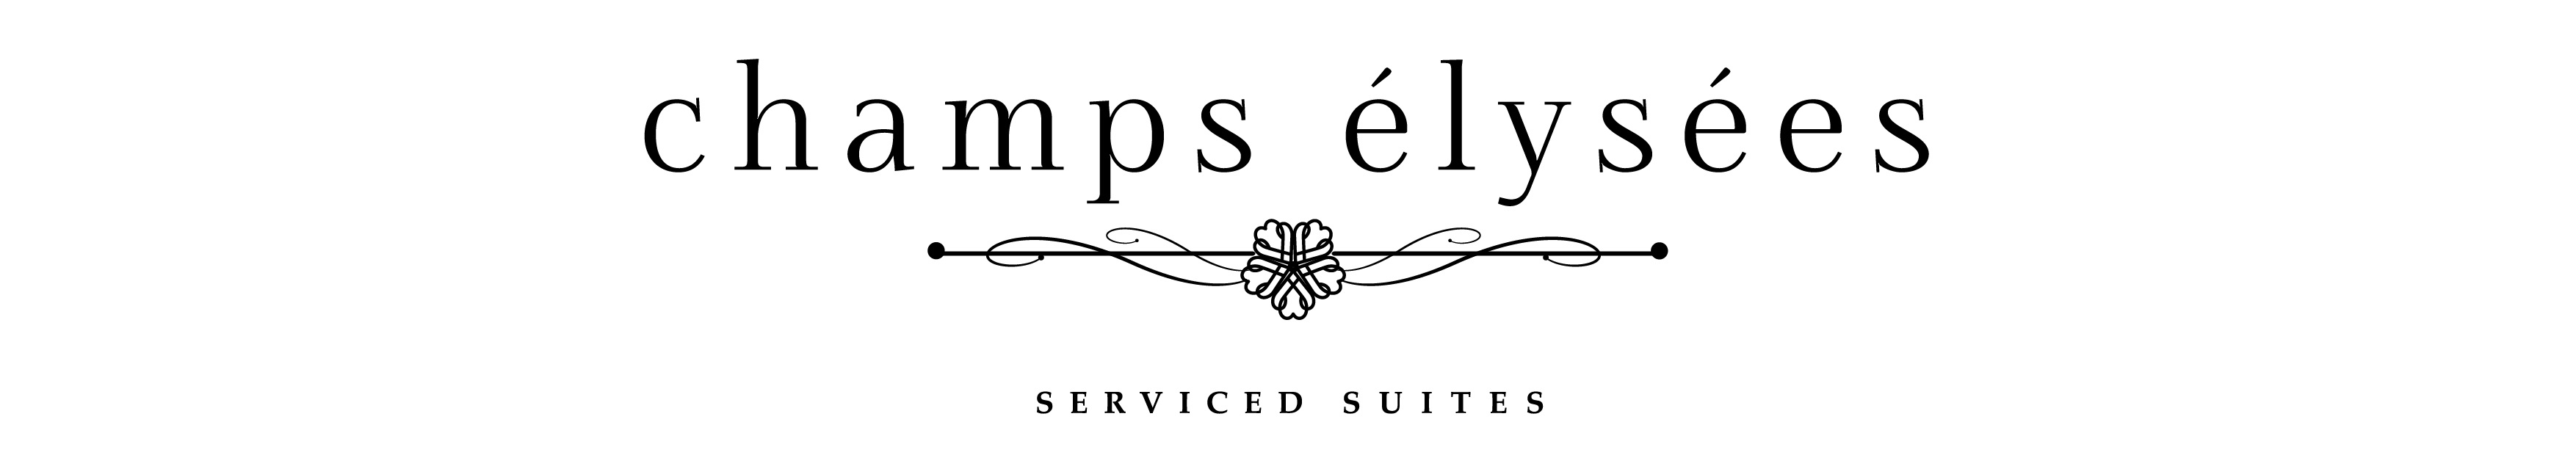 Champs Elysees Final Logo 10122014-1.jpg